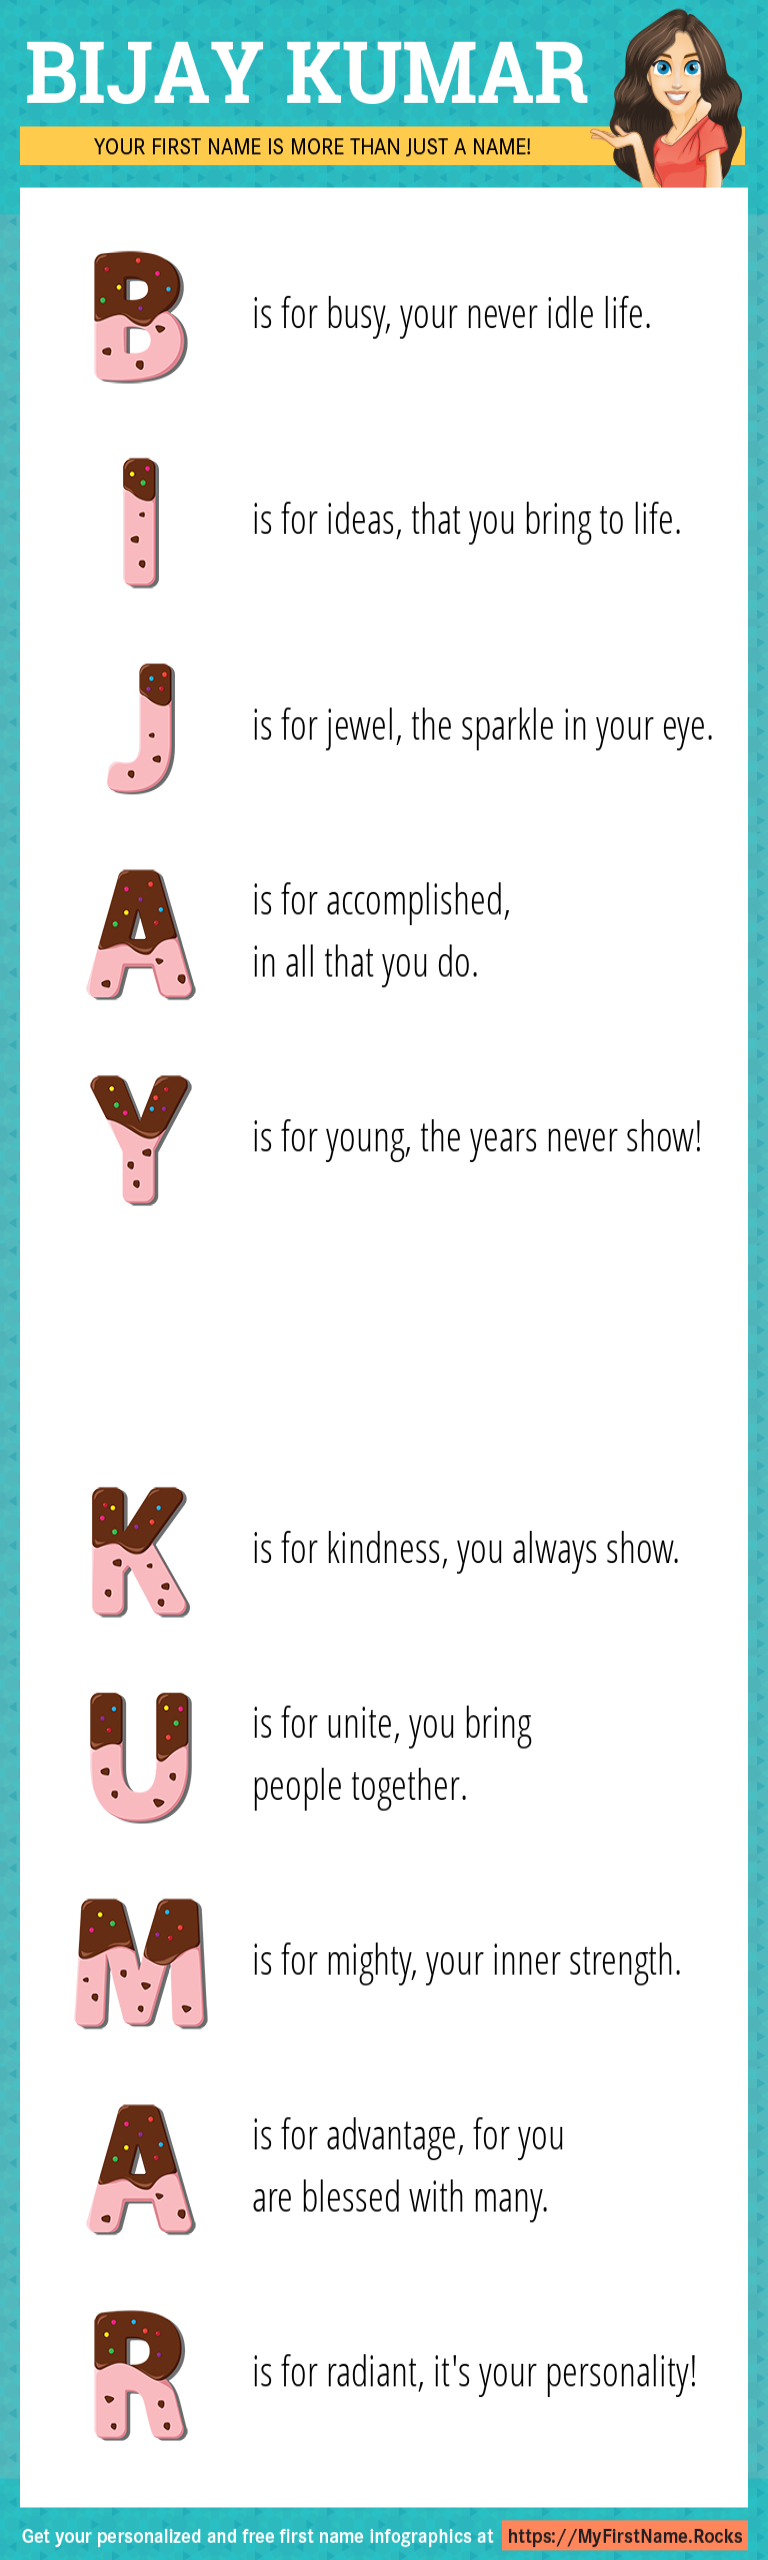 Bijay Kumar Infographics